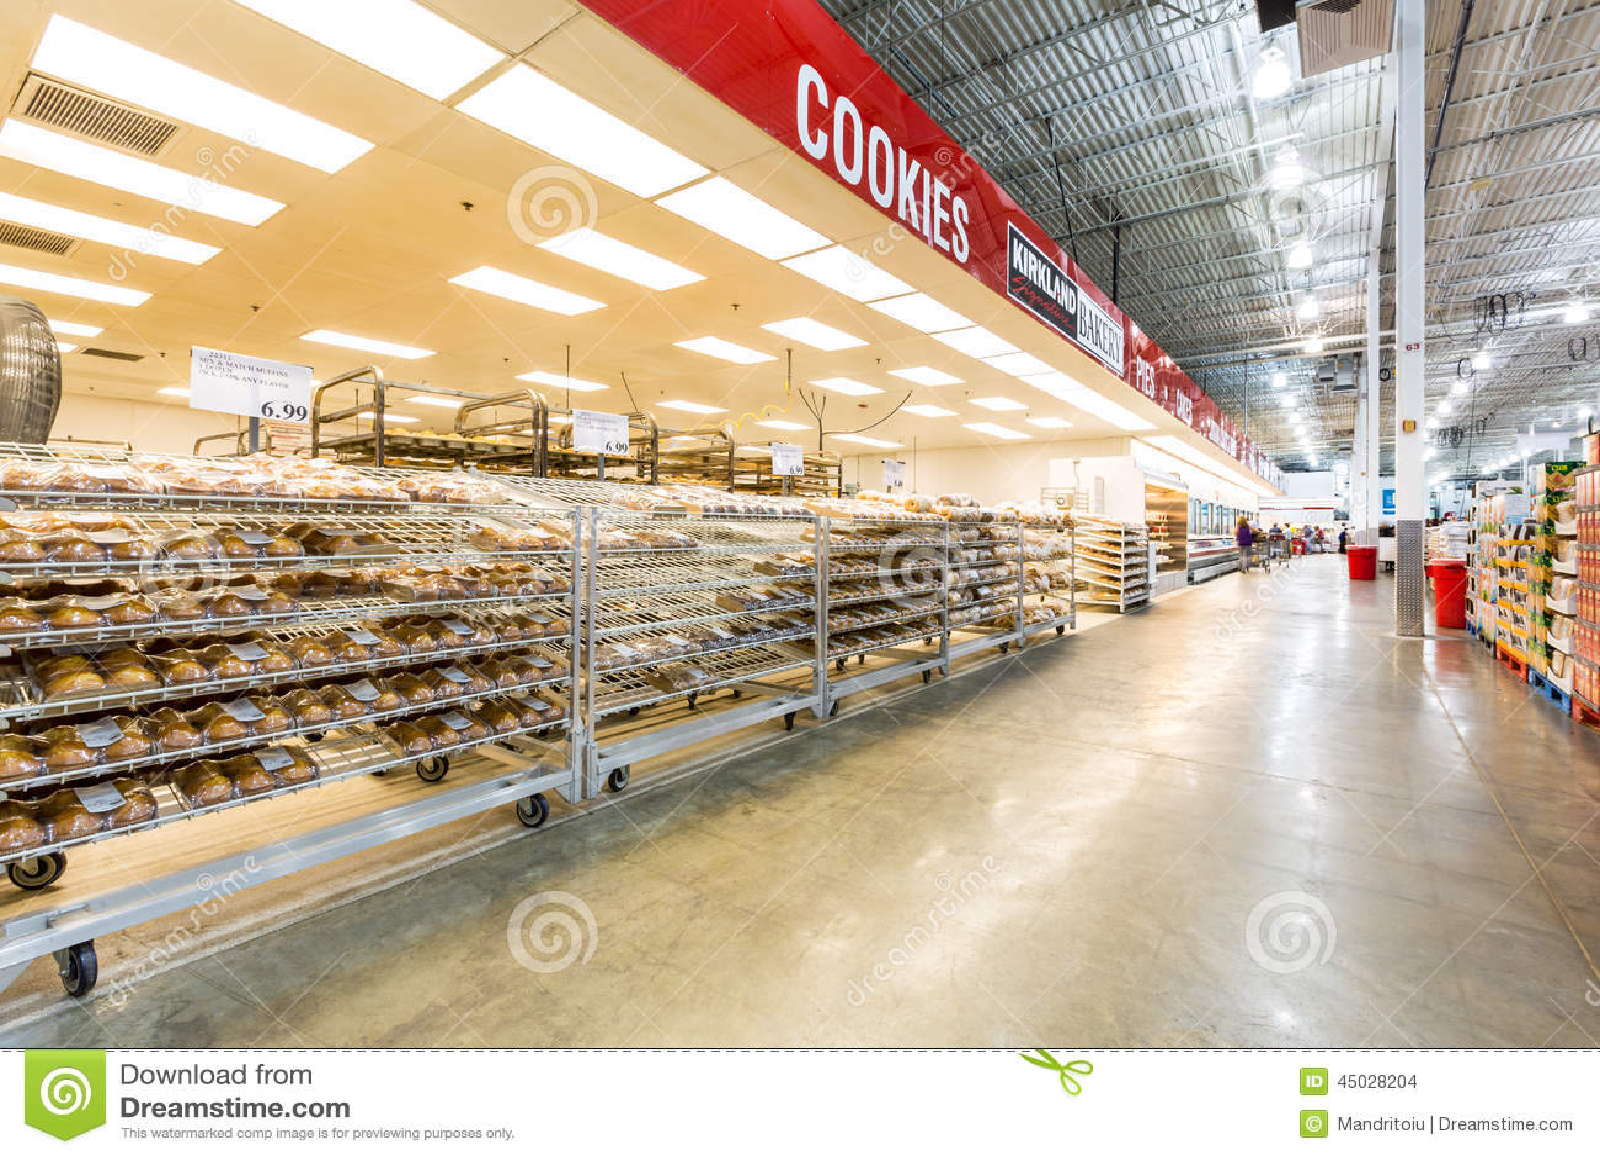 Bakery aisle in a costco store editorial stock image image of download bakery aisle in a costco store editorial stock image image of chain interior altavistaventures Images